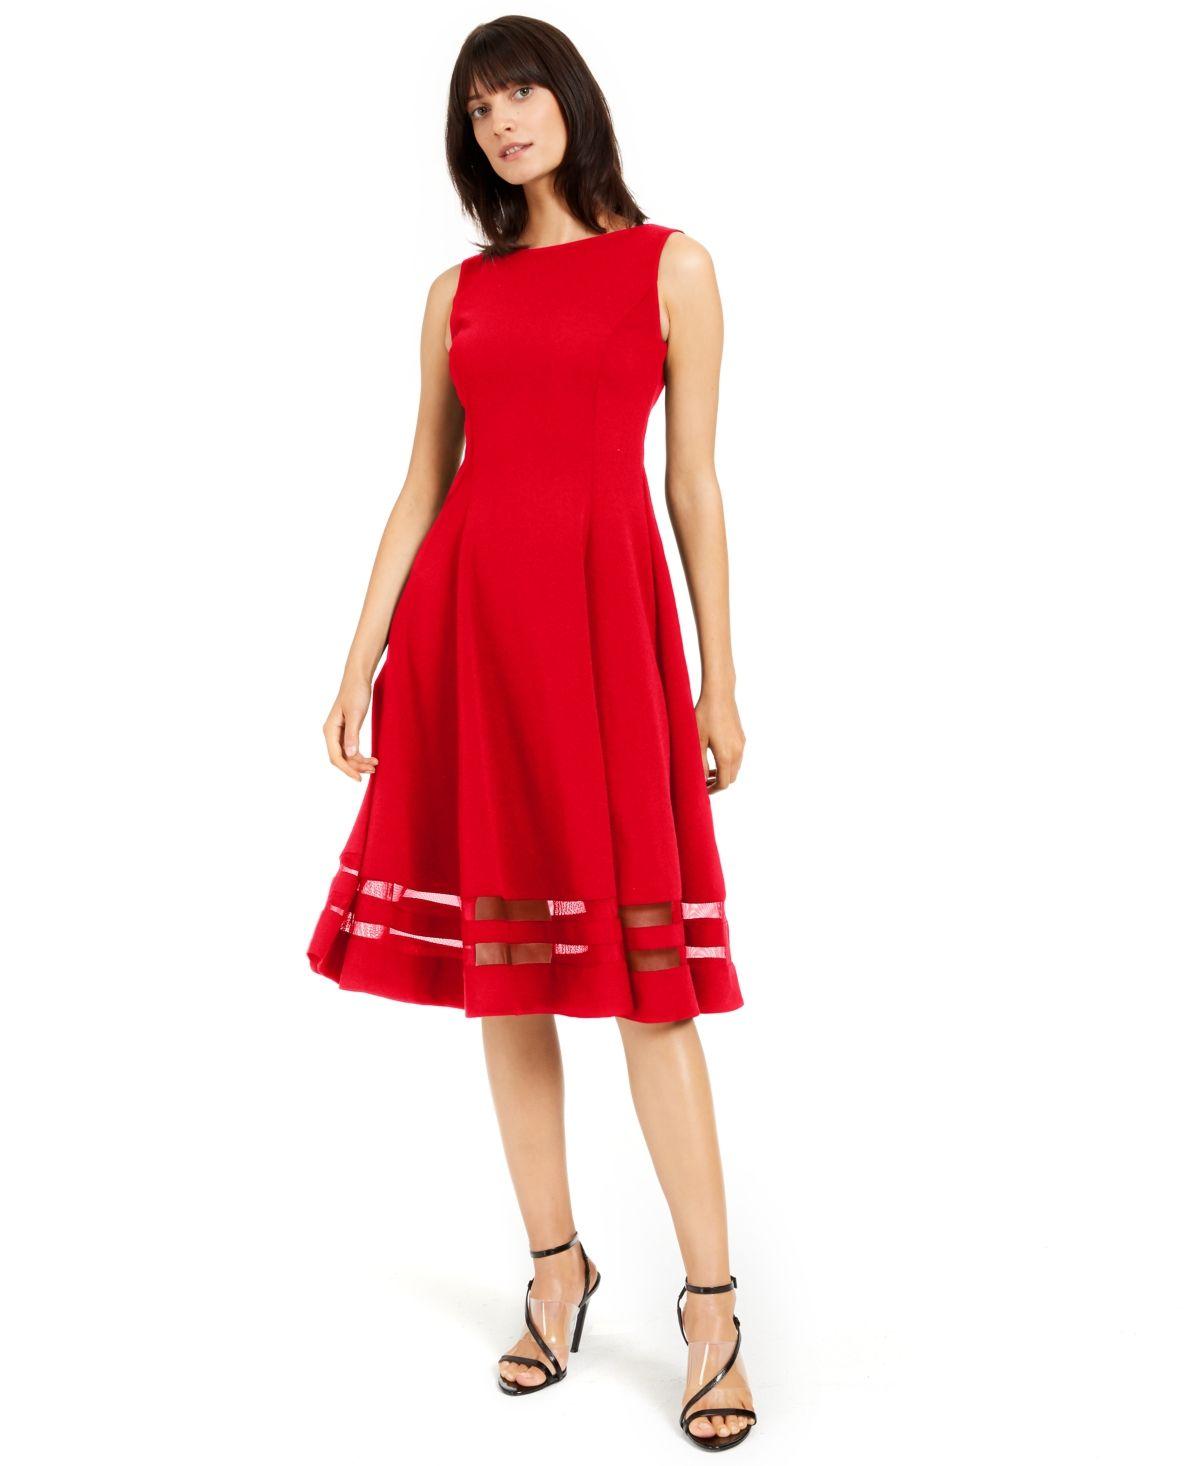 Calvin Klein Illusion Trim Fit Amp Flare Midi Dress Capri